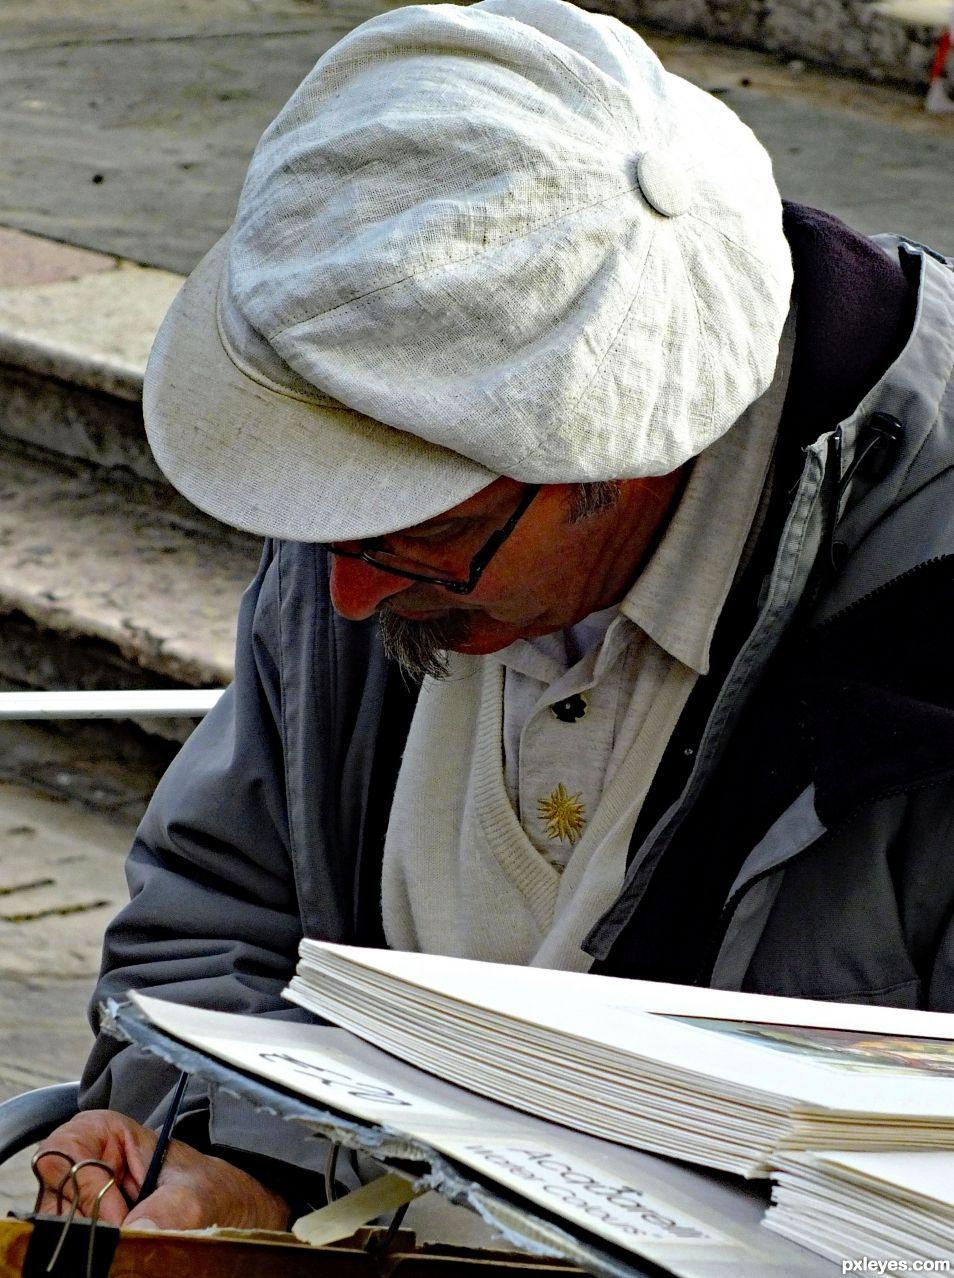 Pavement artist